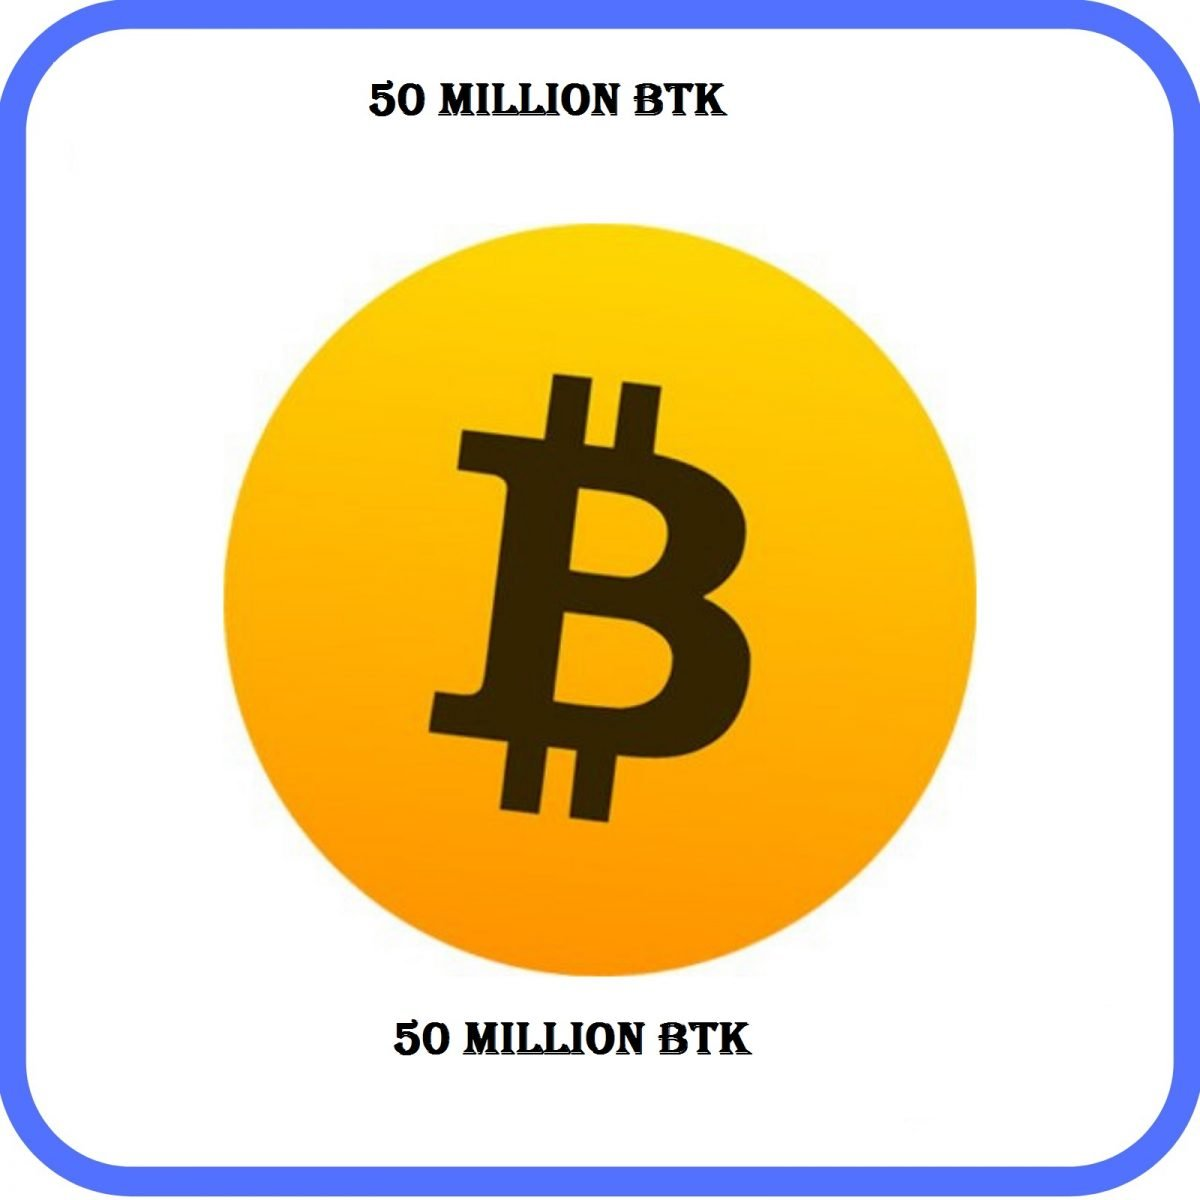 Rent L3 Device Mining Bitcoin-Turbo-Koin Get 50 Million BTK